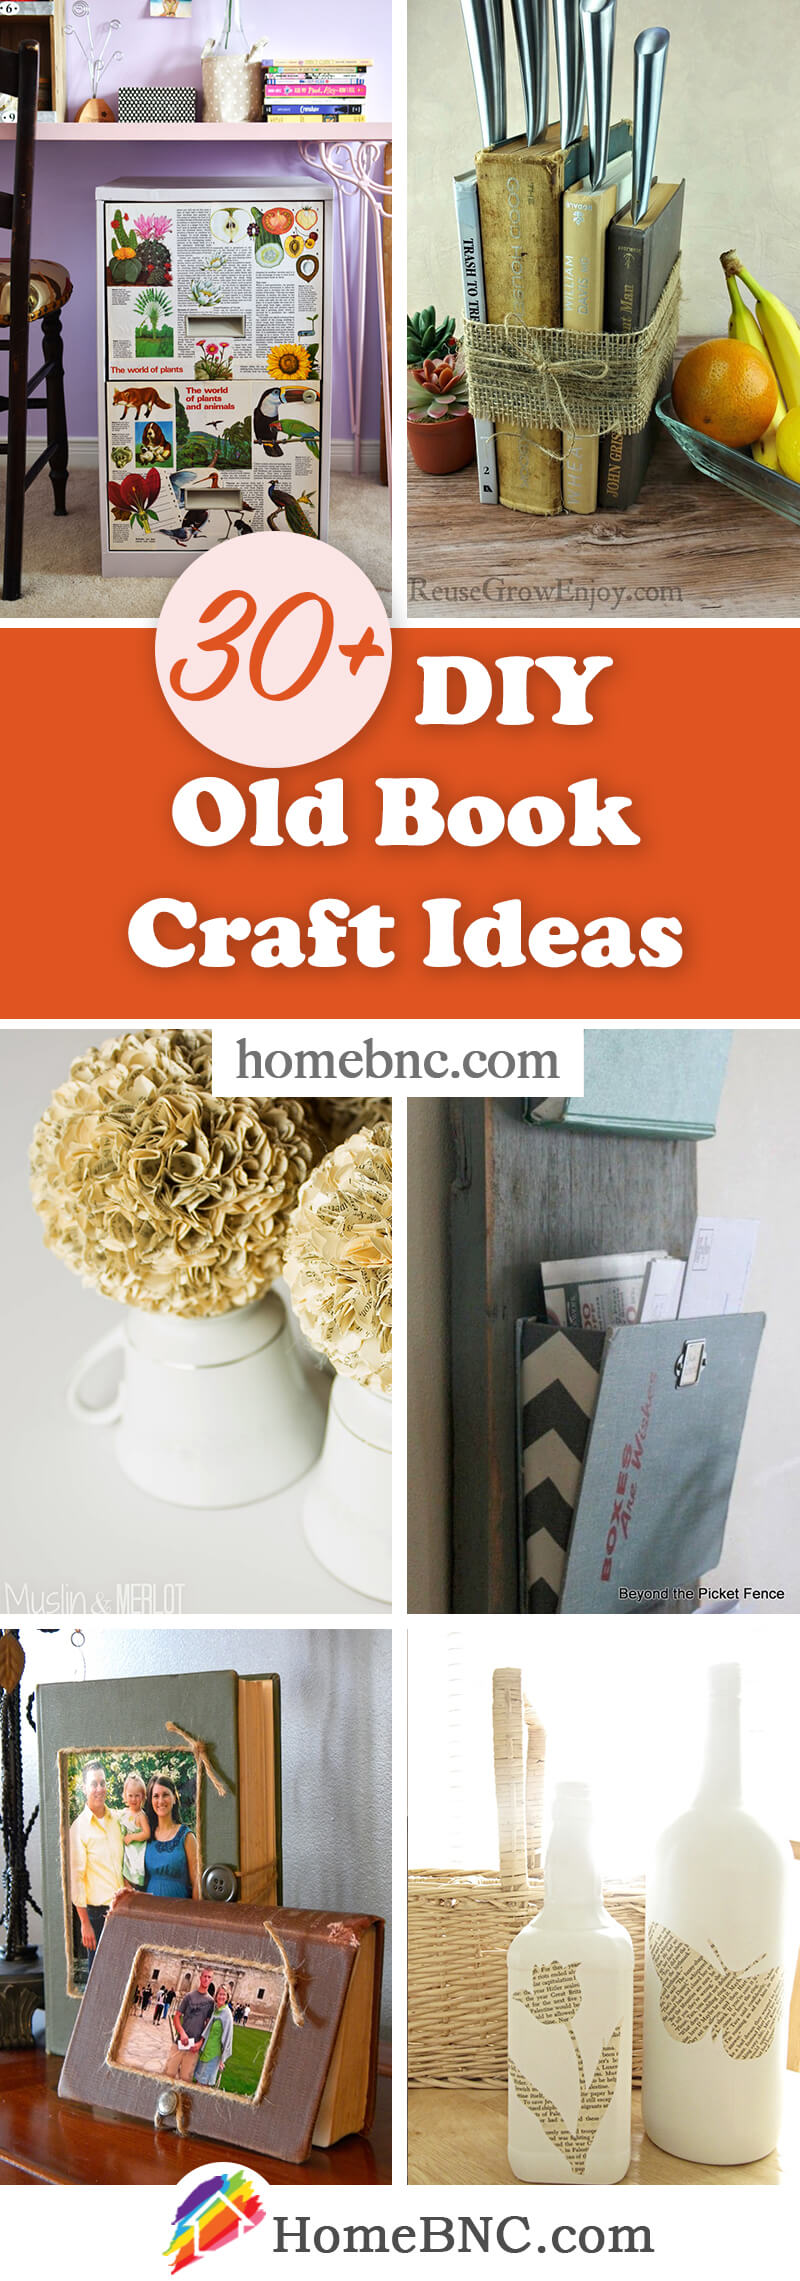 DIY Old Book Crafts